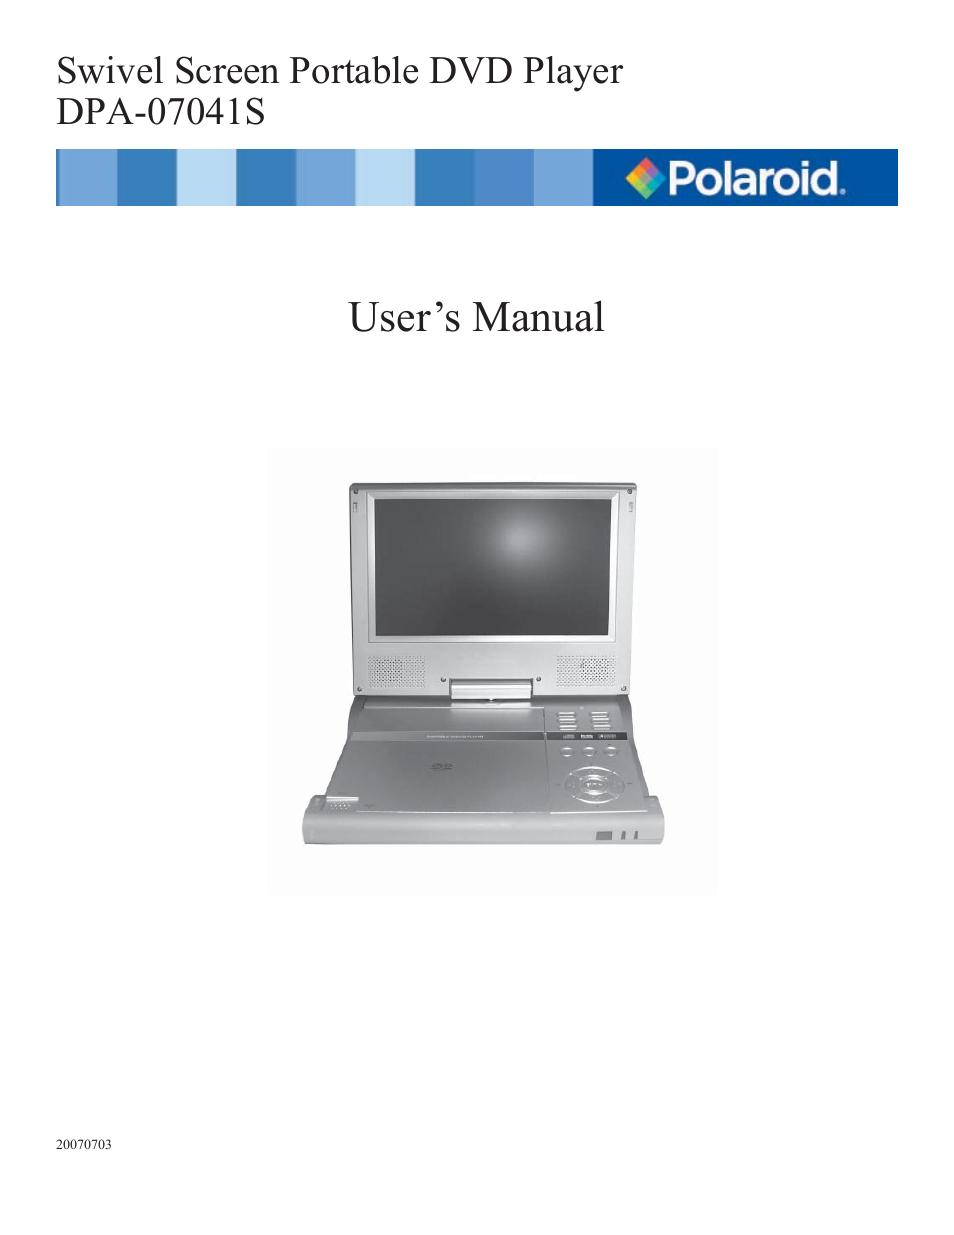 polaroid dpa 07041s user manual 34 pages original mode rh manualsdir com Polaroid 7 Portable DVD Player Silver Polaroid 7 Portable DVD Player Silver